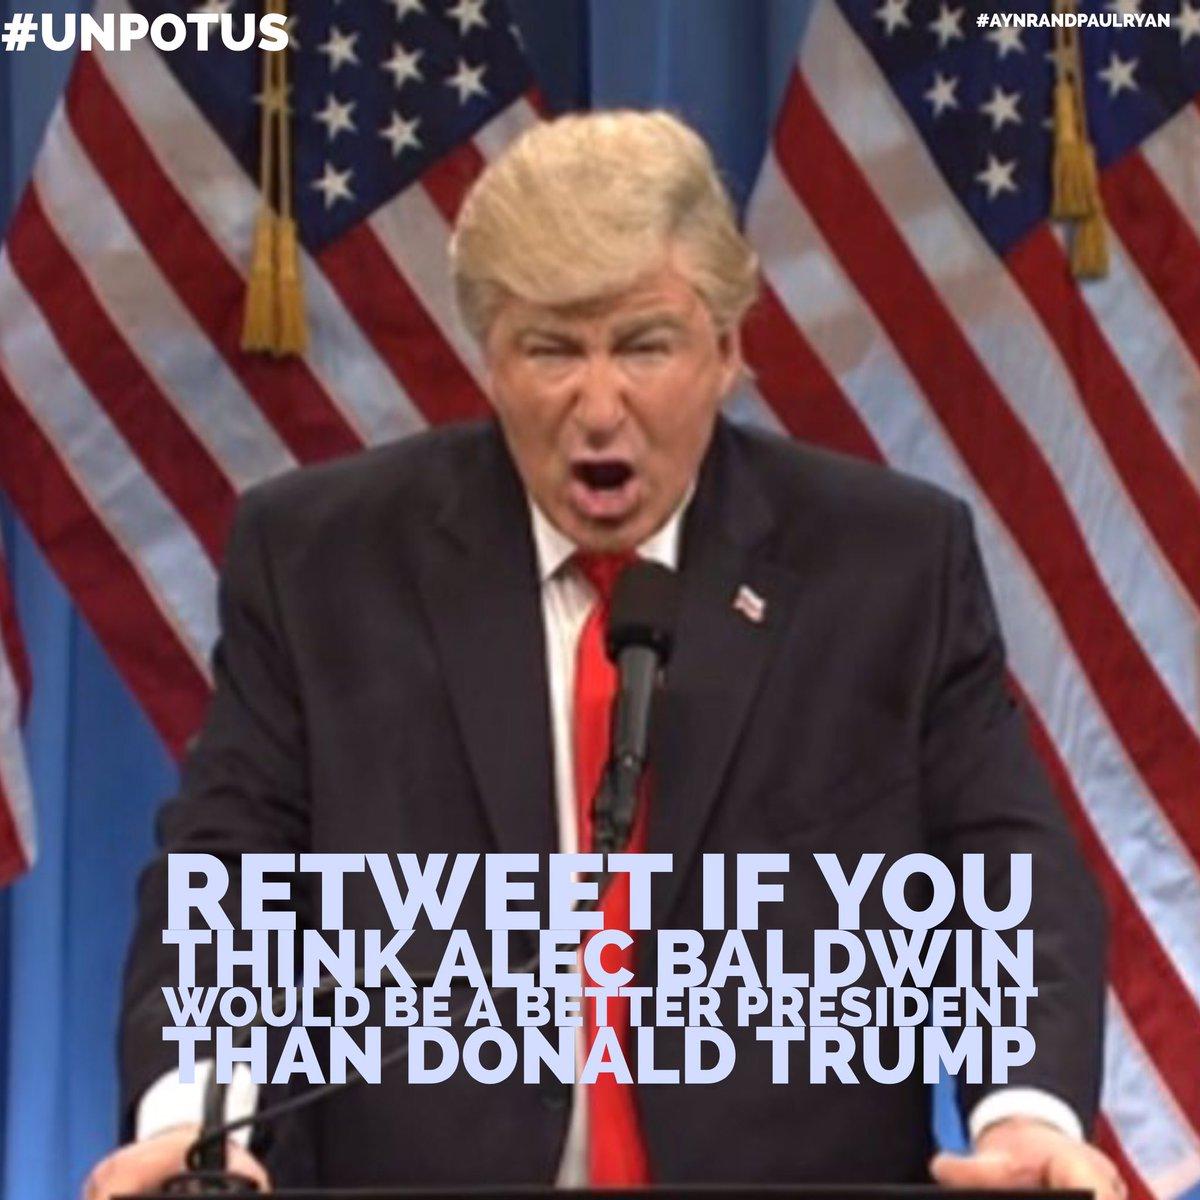 RT @AynRandPaulRyan: @realDonaldTrump #demforce #unPOTUS https://t.co/d3rAdiH4TB